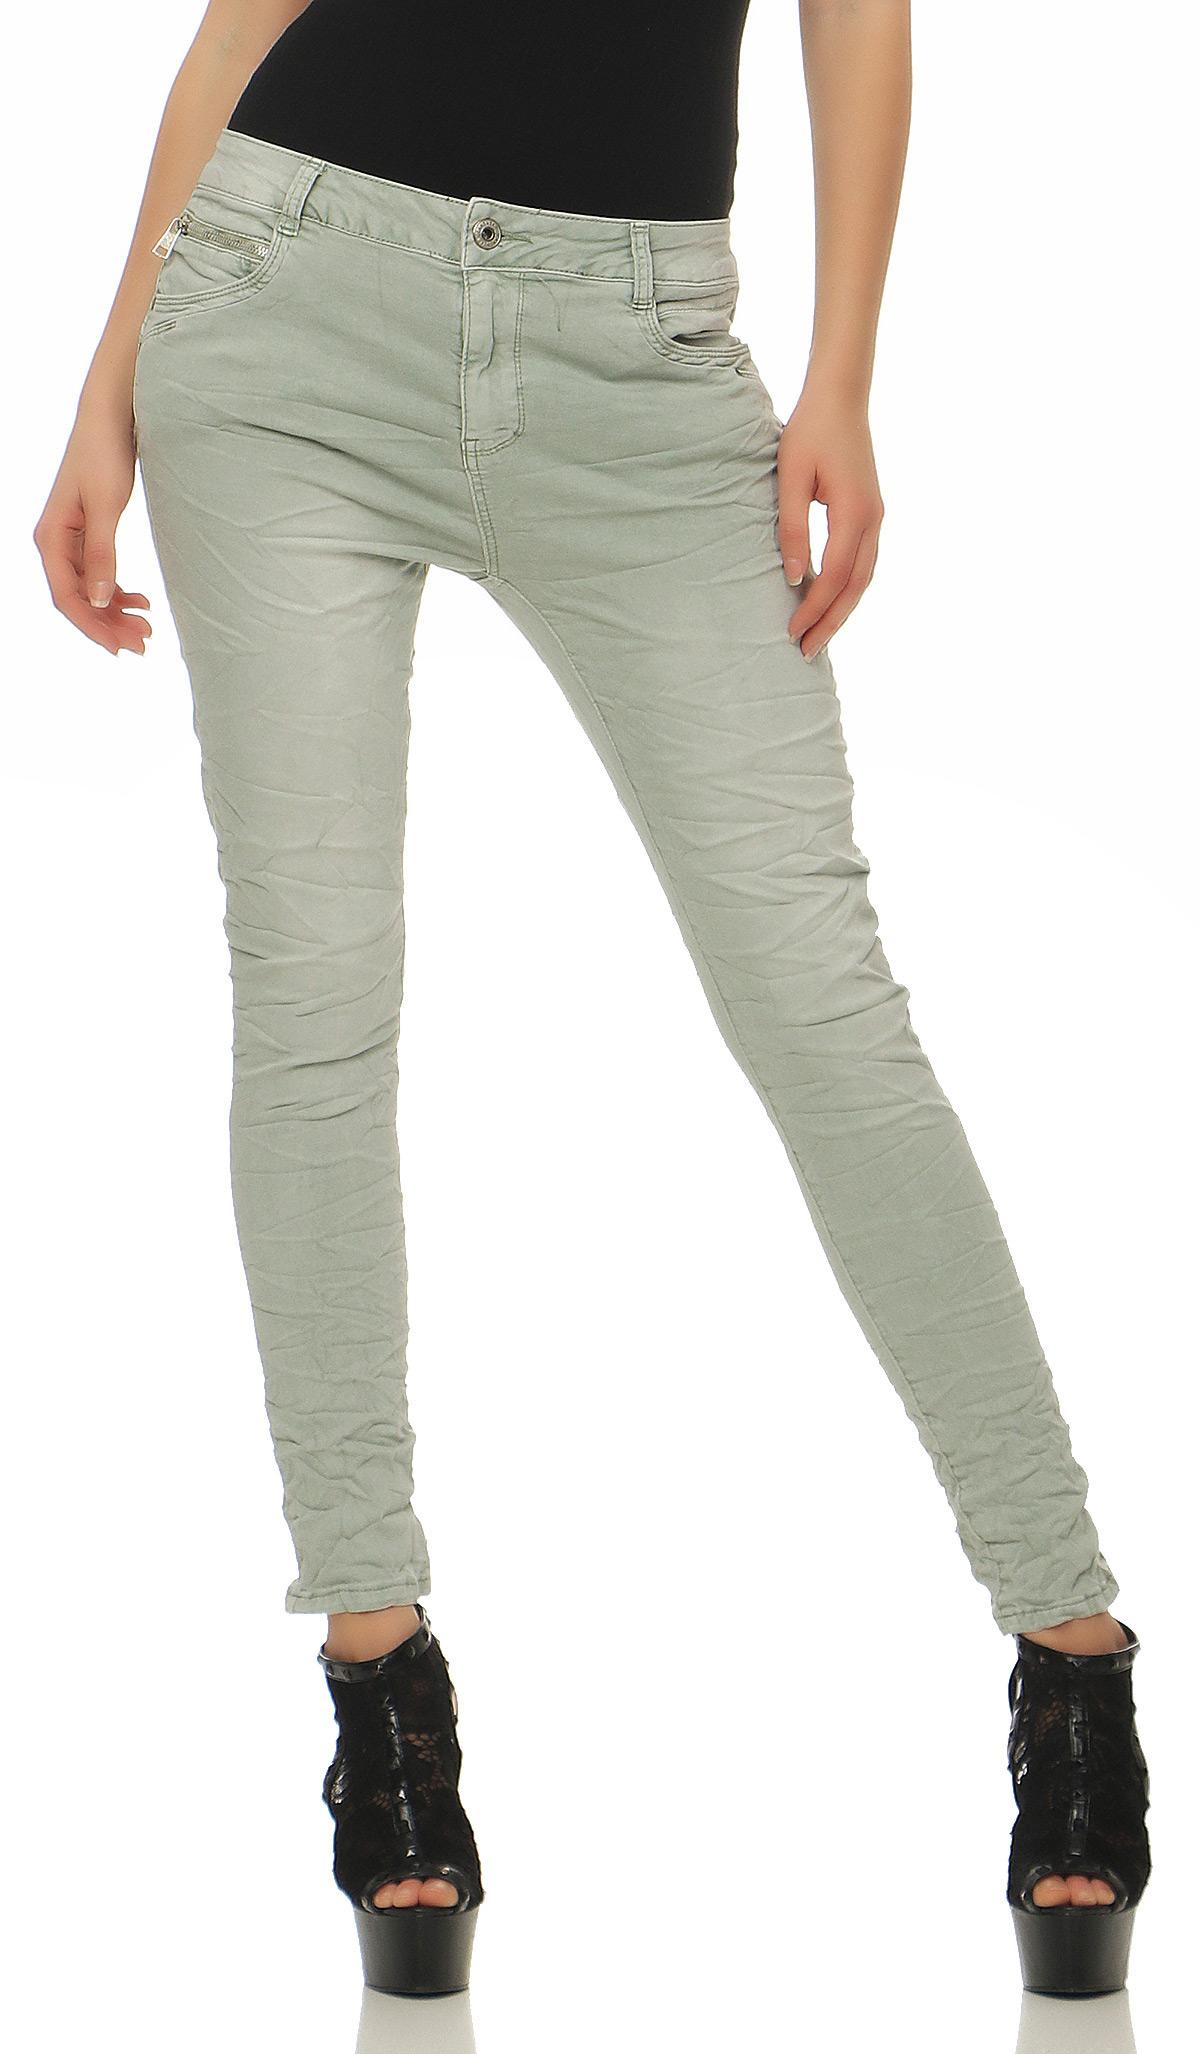 lexxury damen jeans h fthose baggy pants chino lange hose. Black Bedroom Furniture Sets. Home Design Ideas